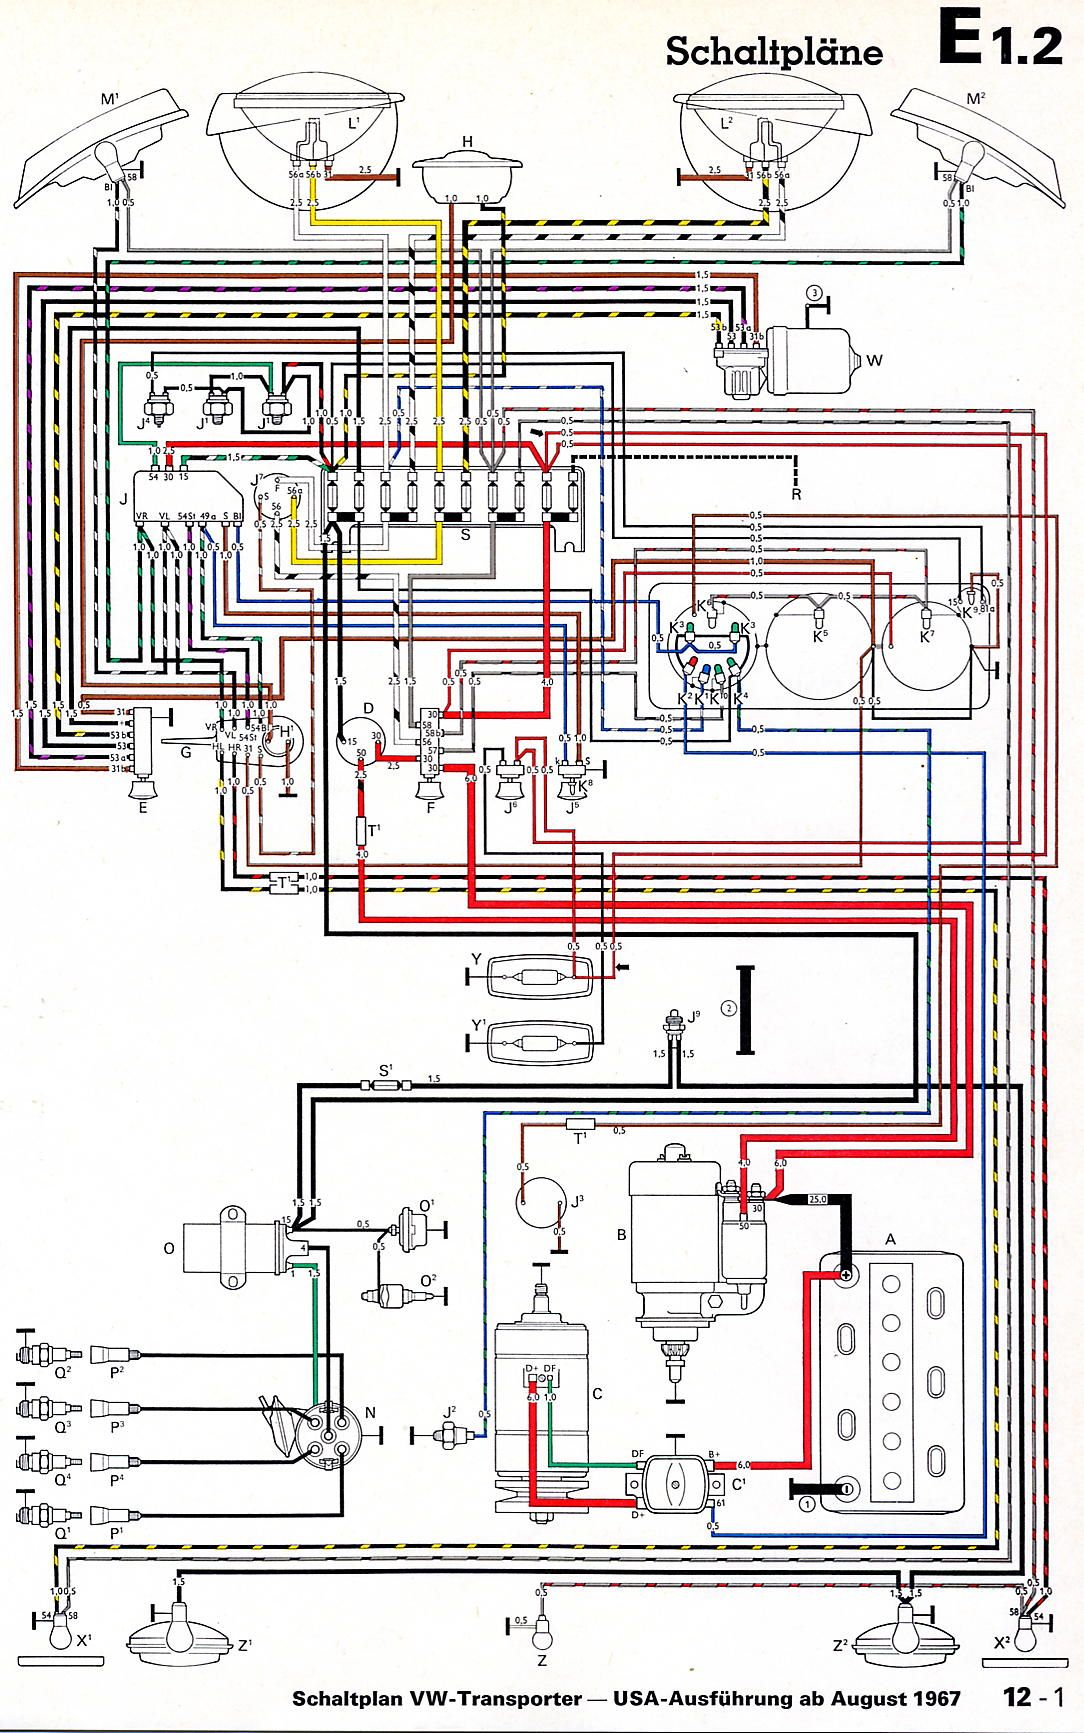 74 Vw Bus Wiring Diagram Wiring Diagram Export Arch Suitcase Arch Suitcase Congressosifo2018 It